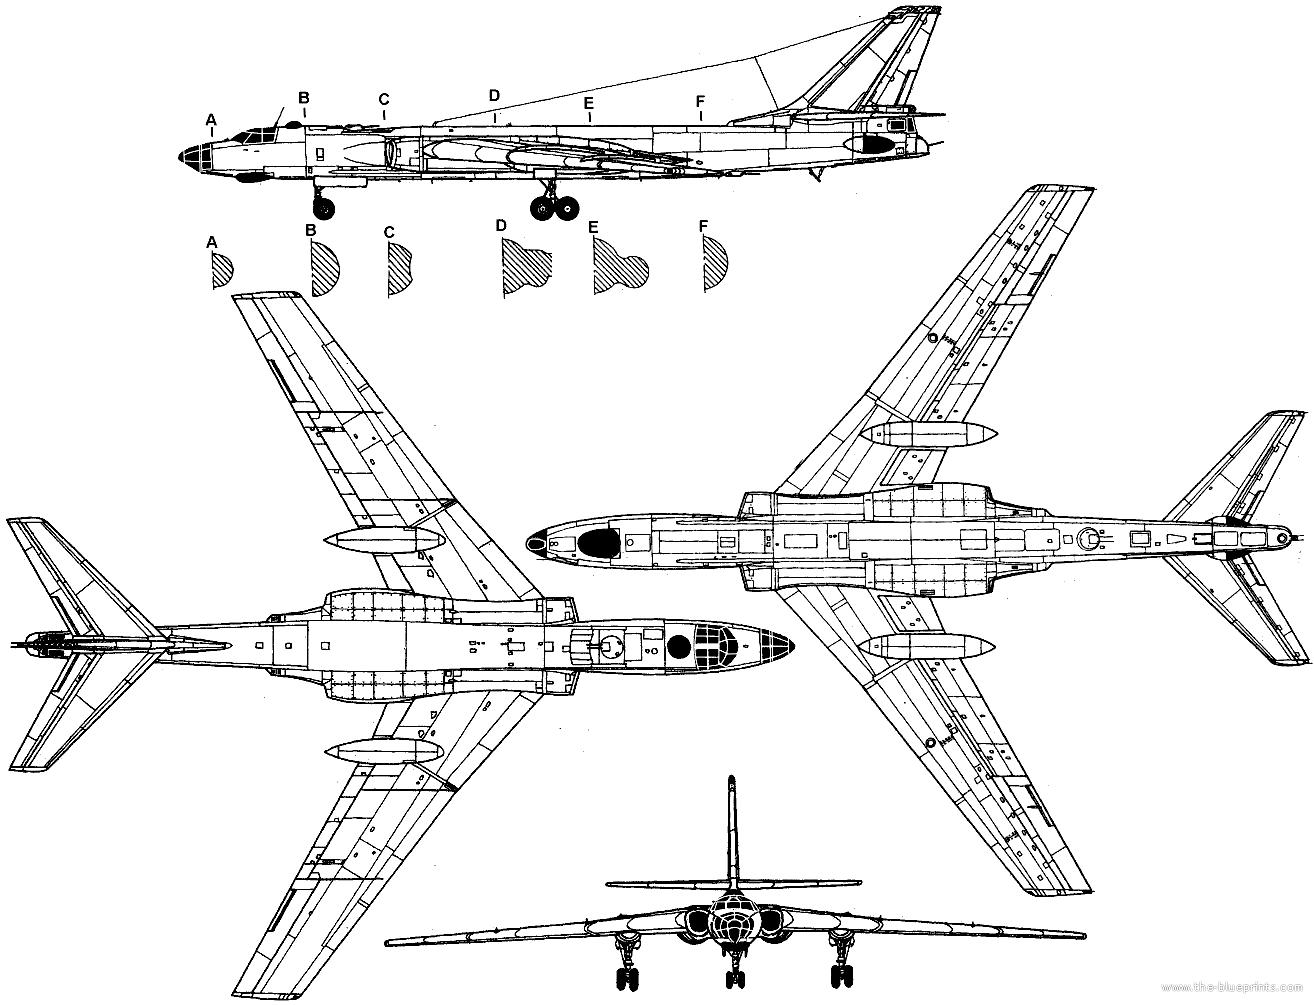 Blueprints Gt Modern Airplanes Gt Tupolev Gt Tupolev Tu 16